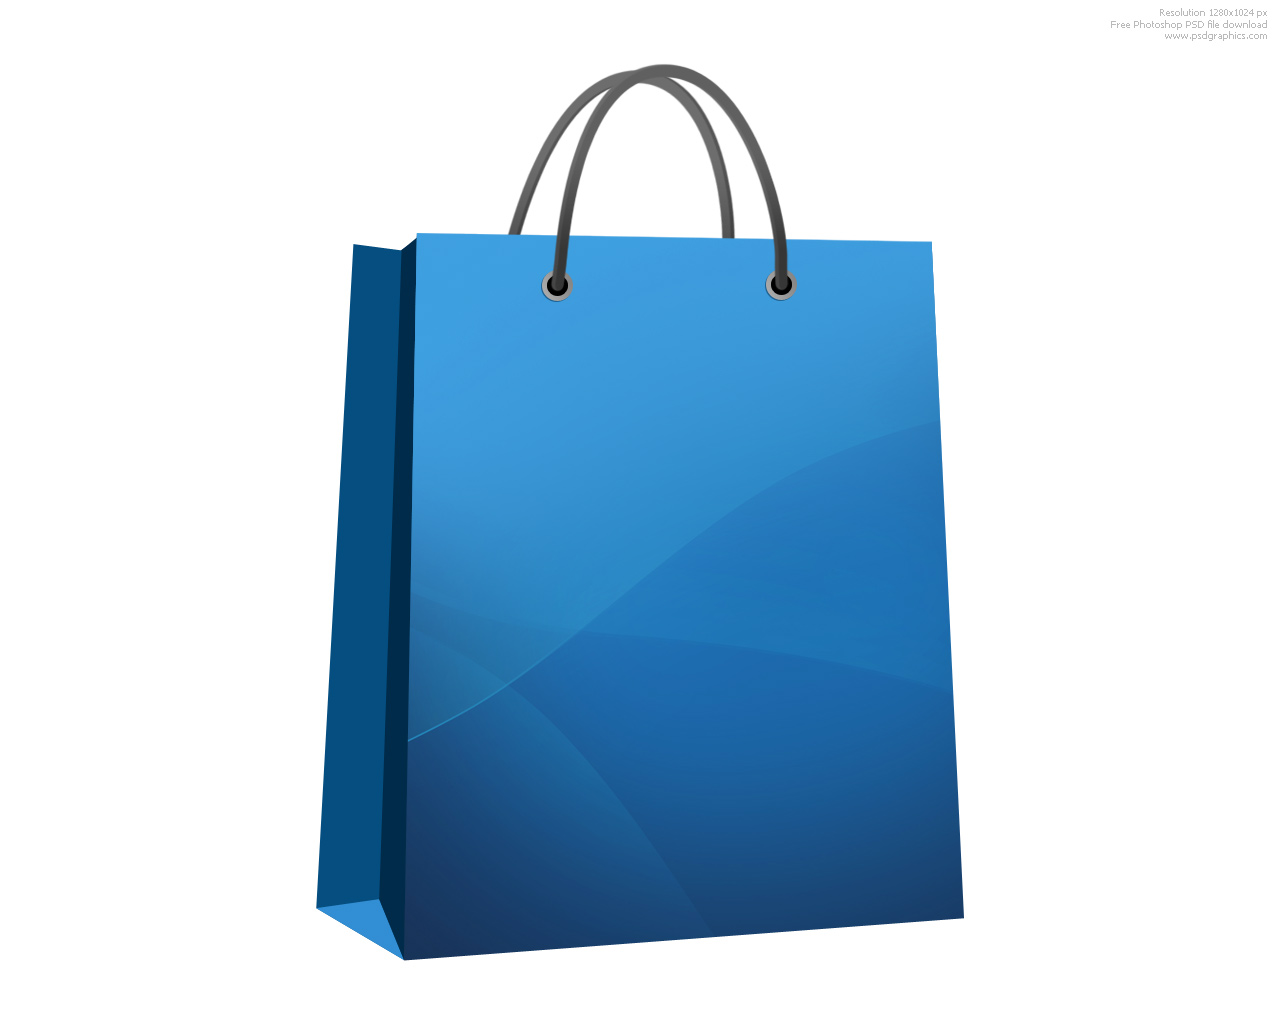 17 Folder Icon Bag Images